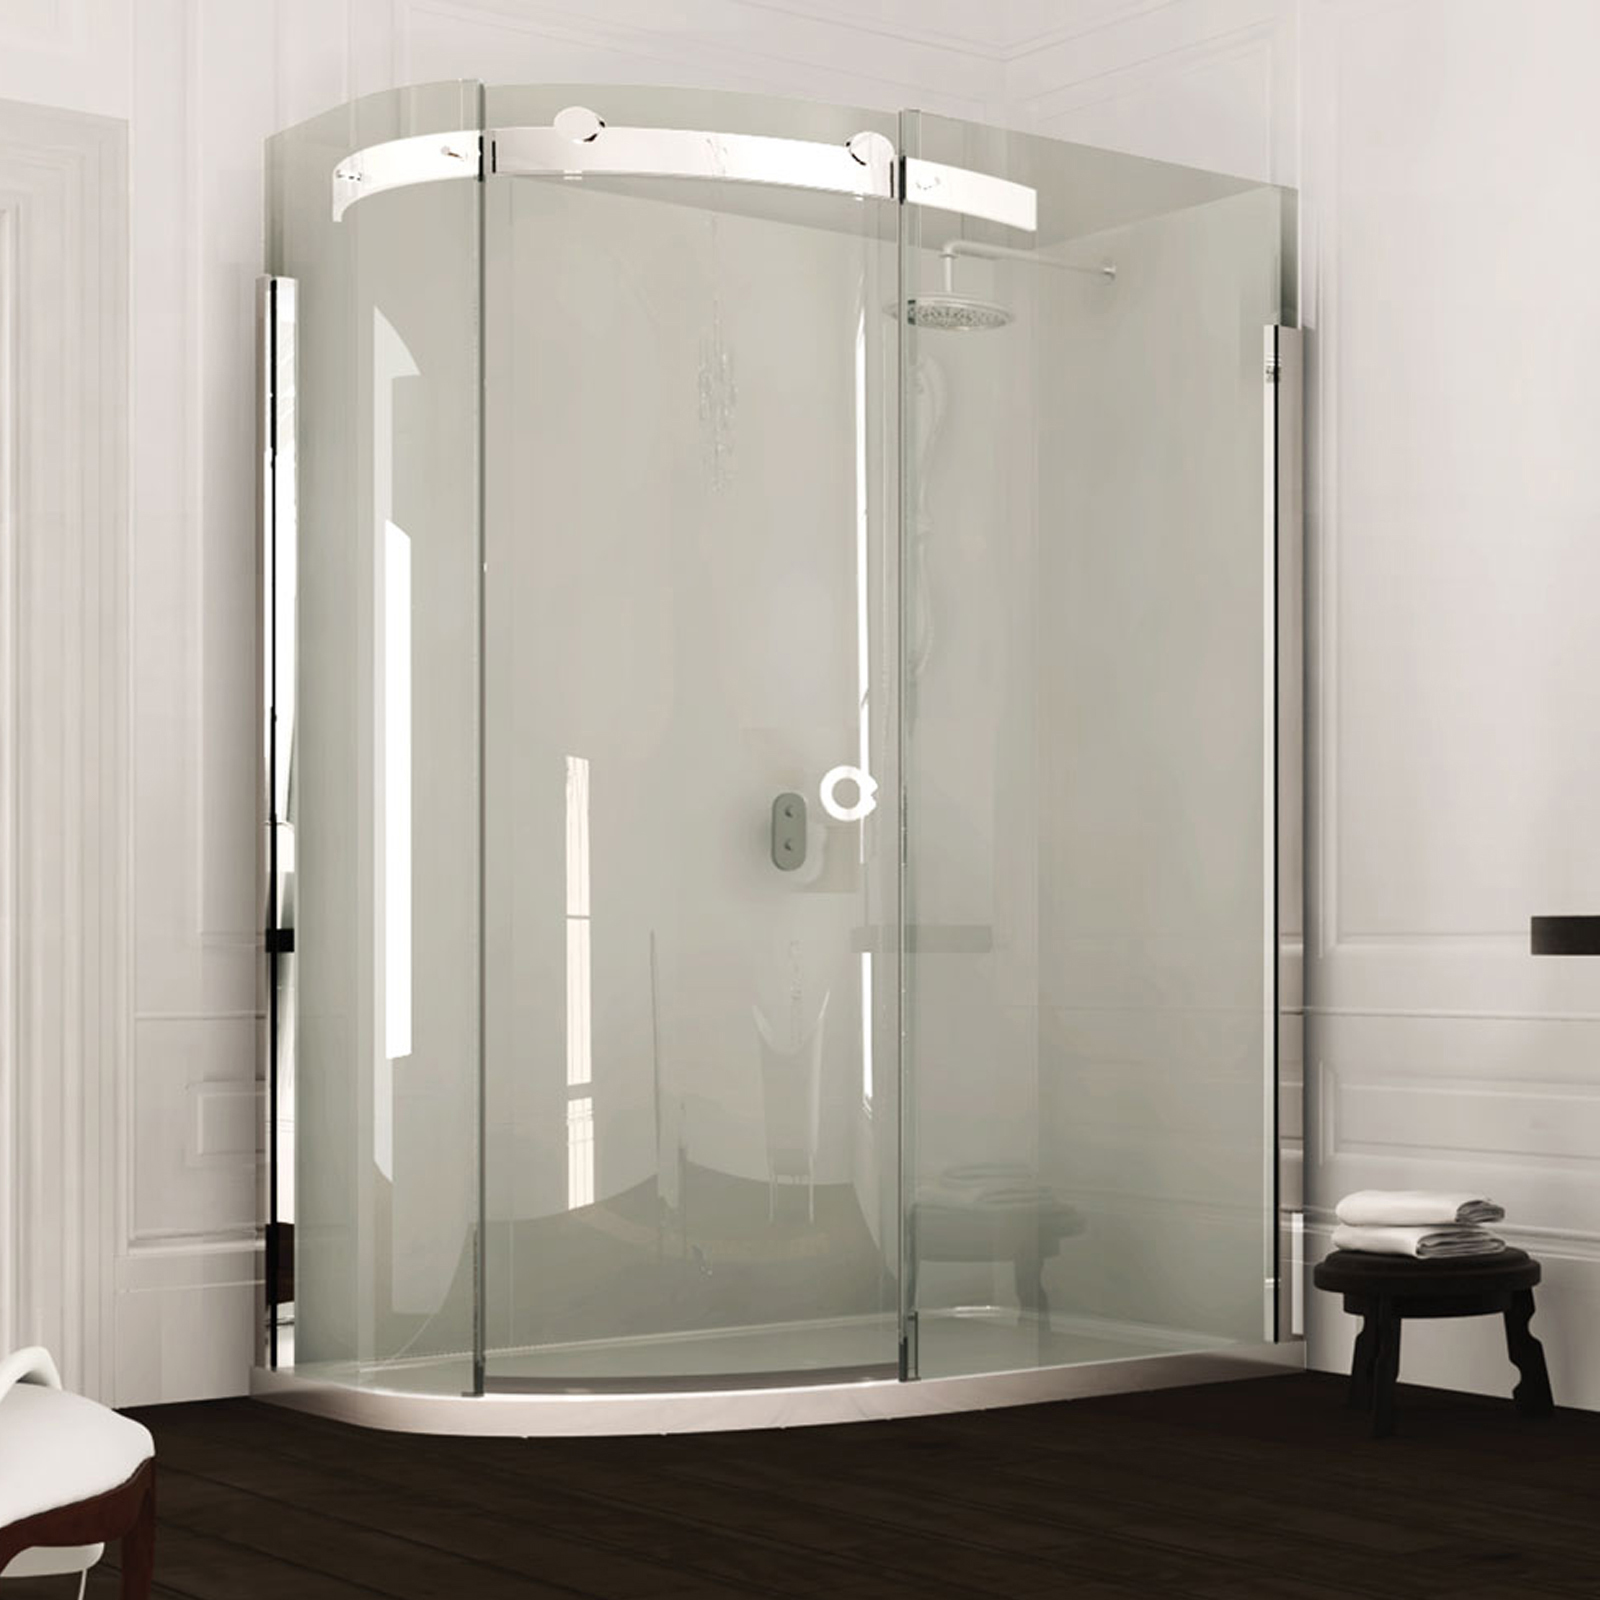 Merlyn Series 10 1 Door Offset Quadrant 1200 X 900mm Lh 132304 At